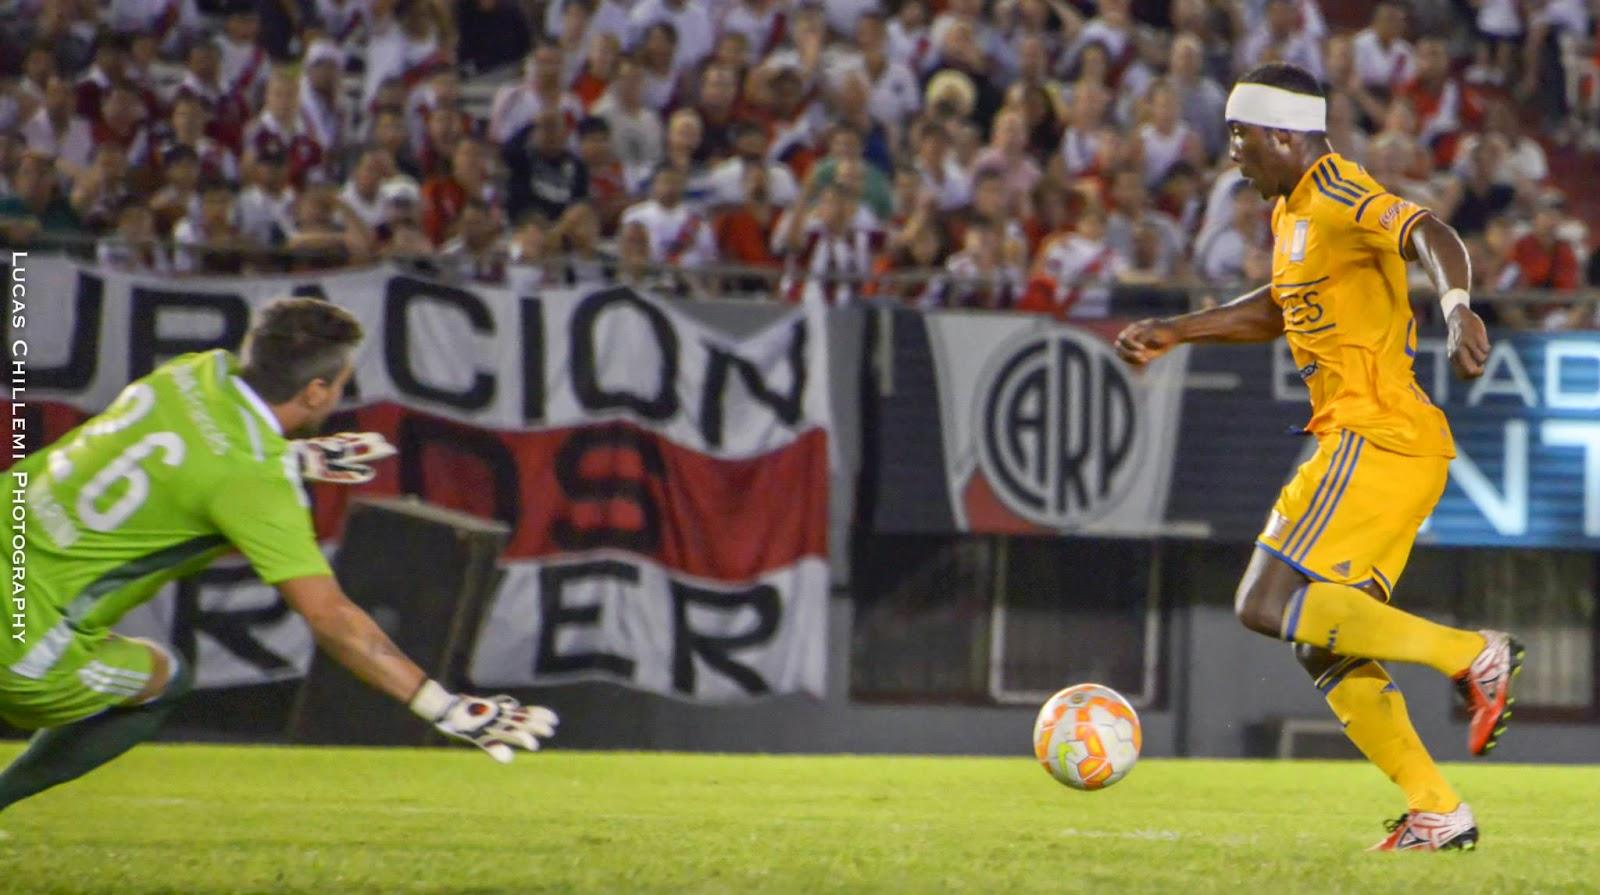 Gerrón, Gerron, Joffre Gerrón, Libertadores, Tigres, River, River Plate, 2015,